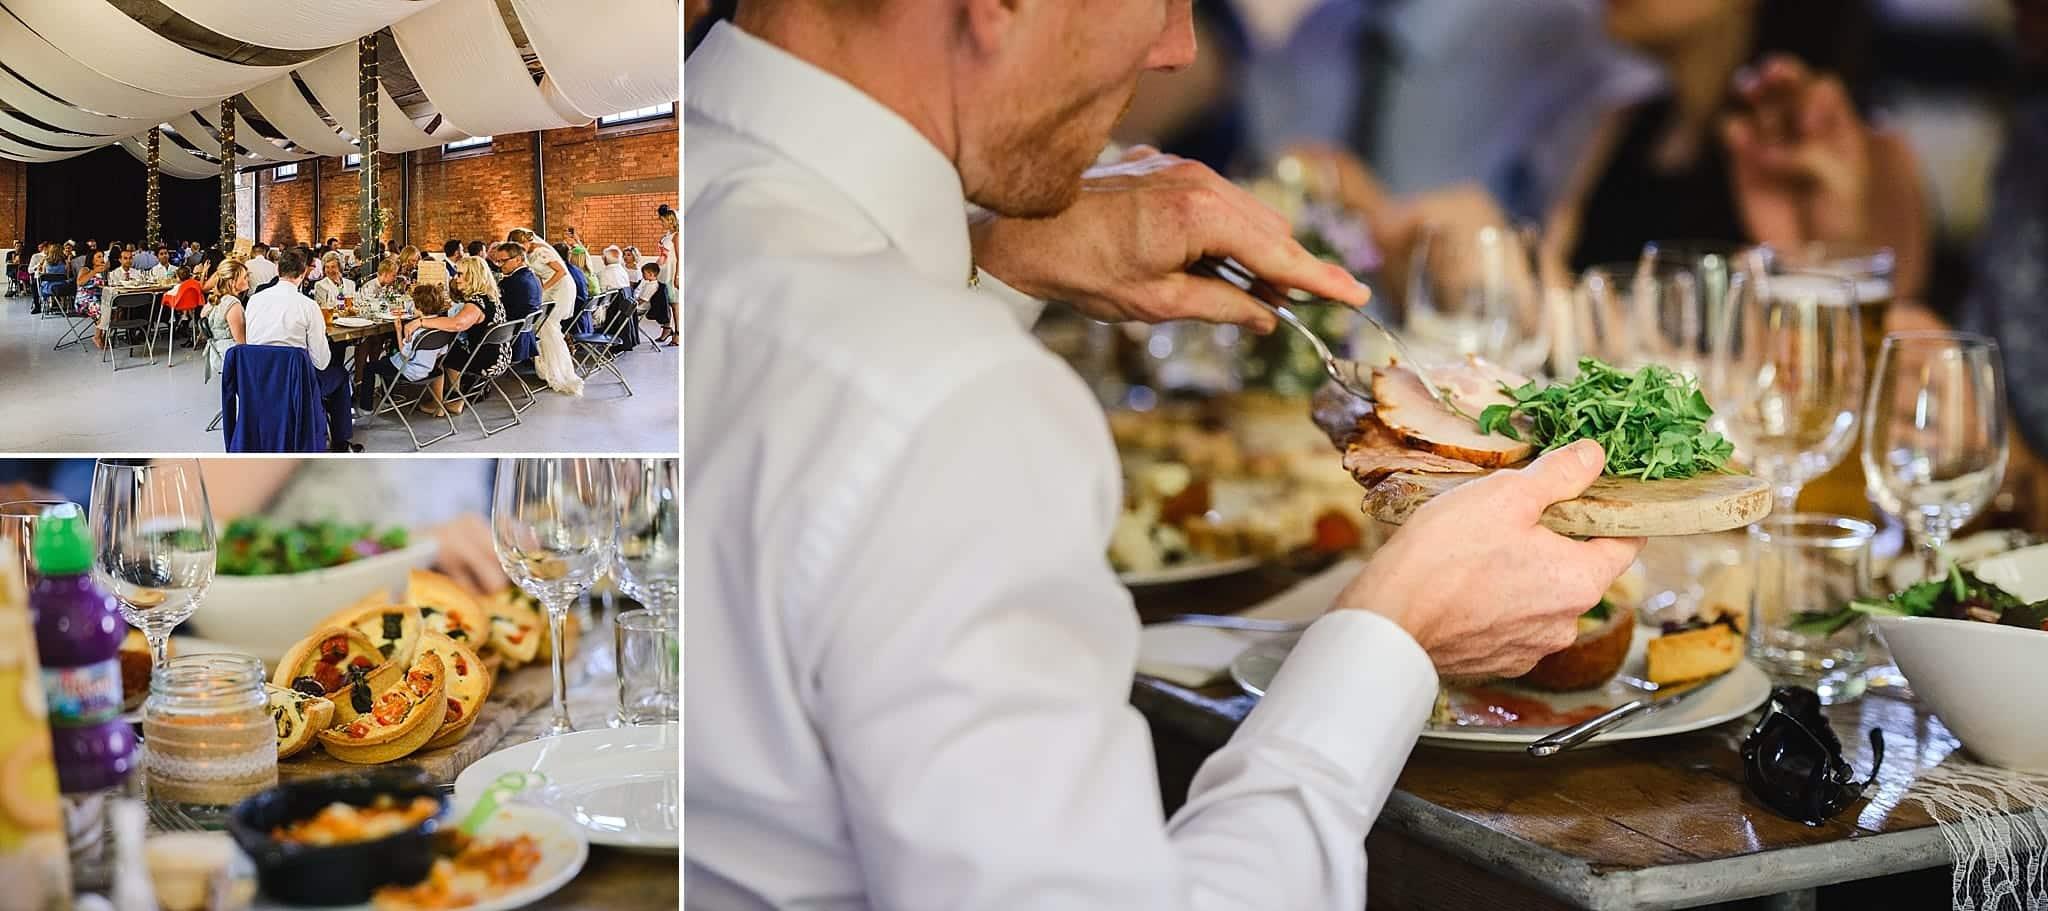 Picnic style buffet wedding food